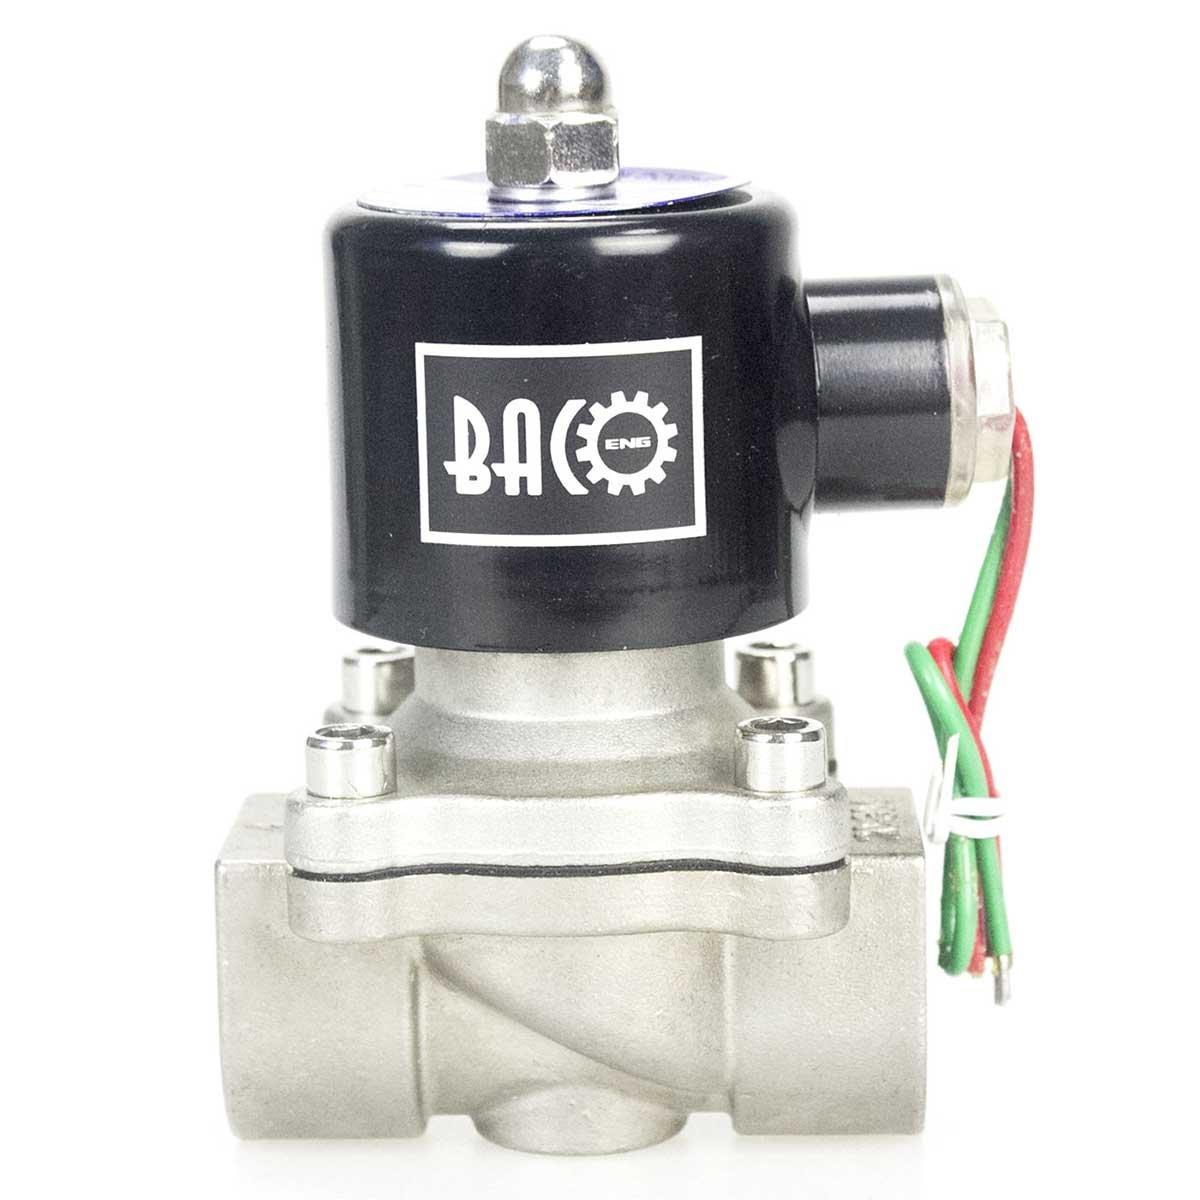 BACOENG DC 24V 1 v/álvula de solenoide el/éctrica Acero inoxidable Solenoid Valve para agua aire aceite NC